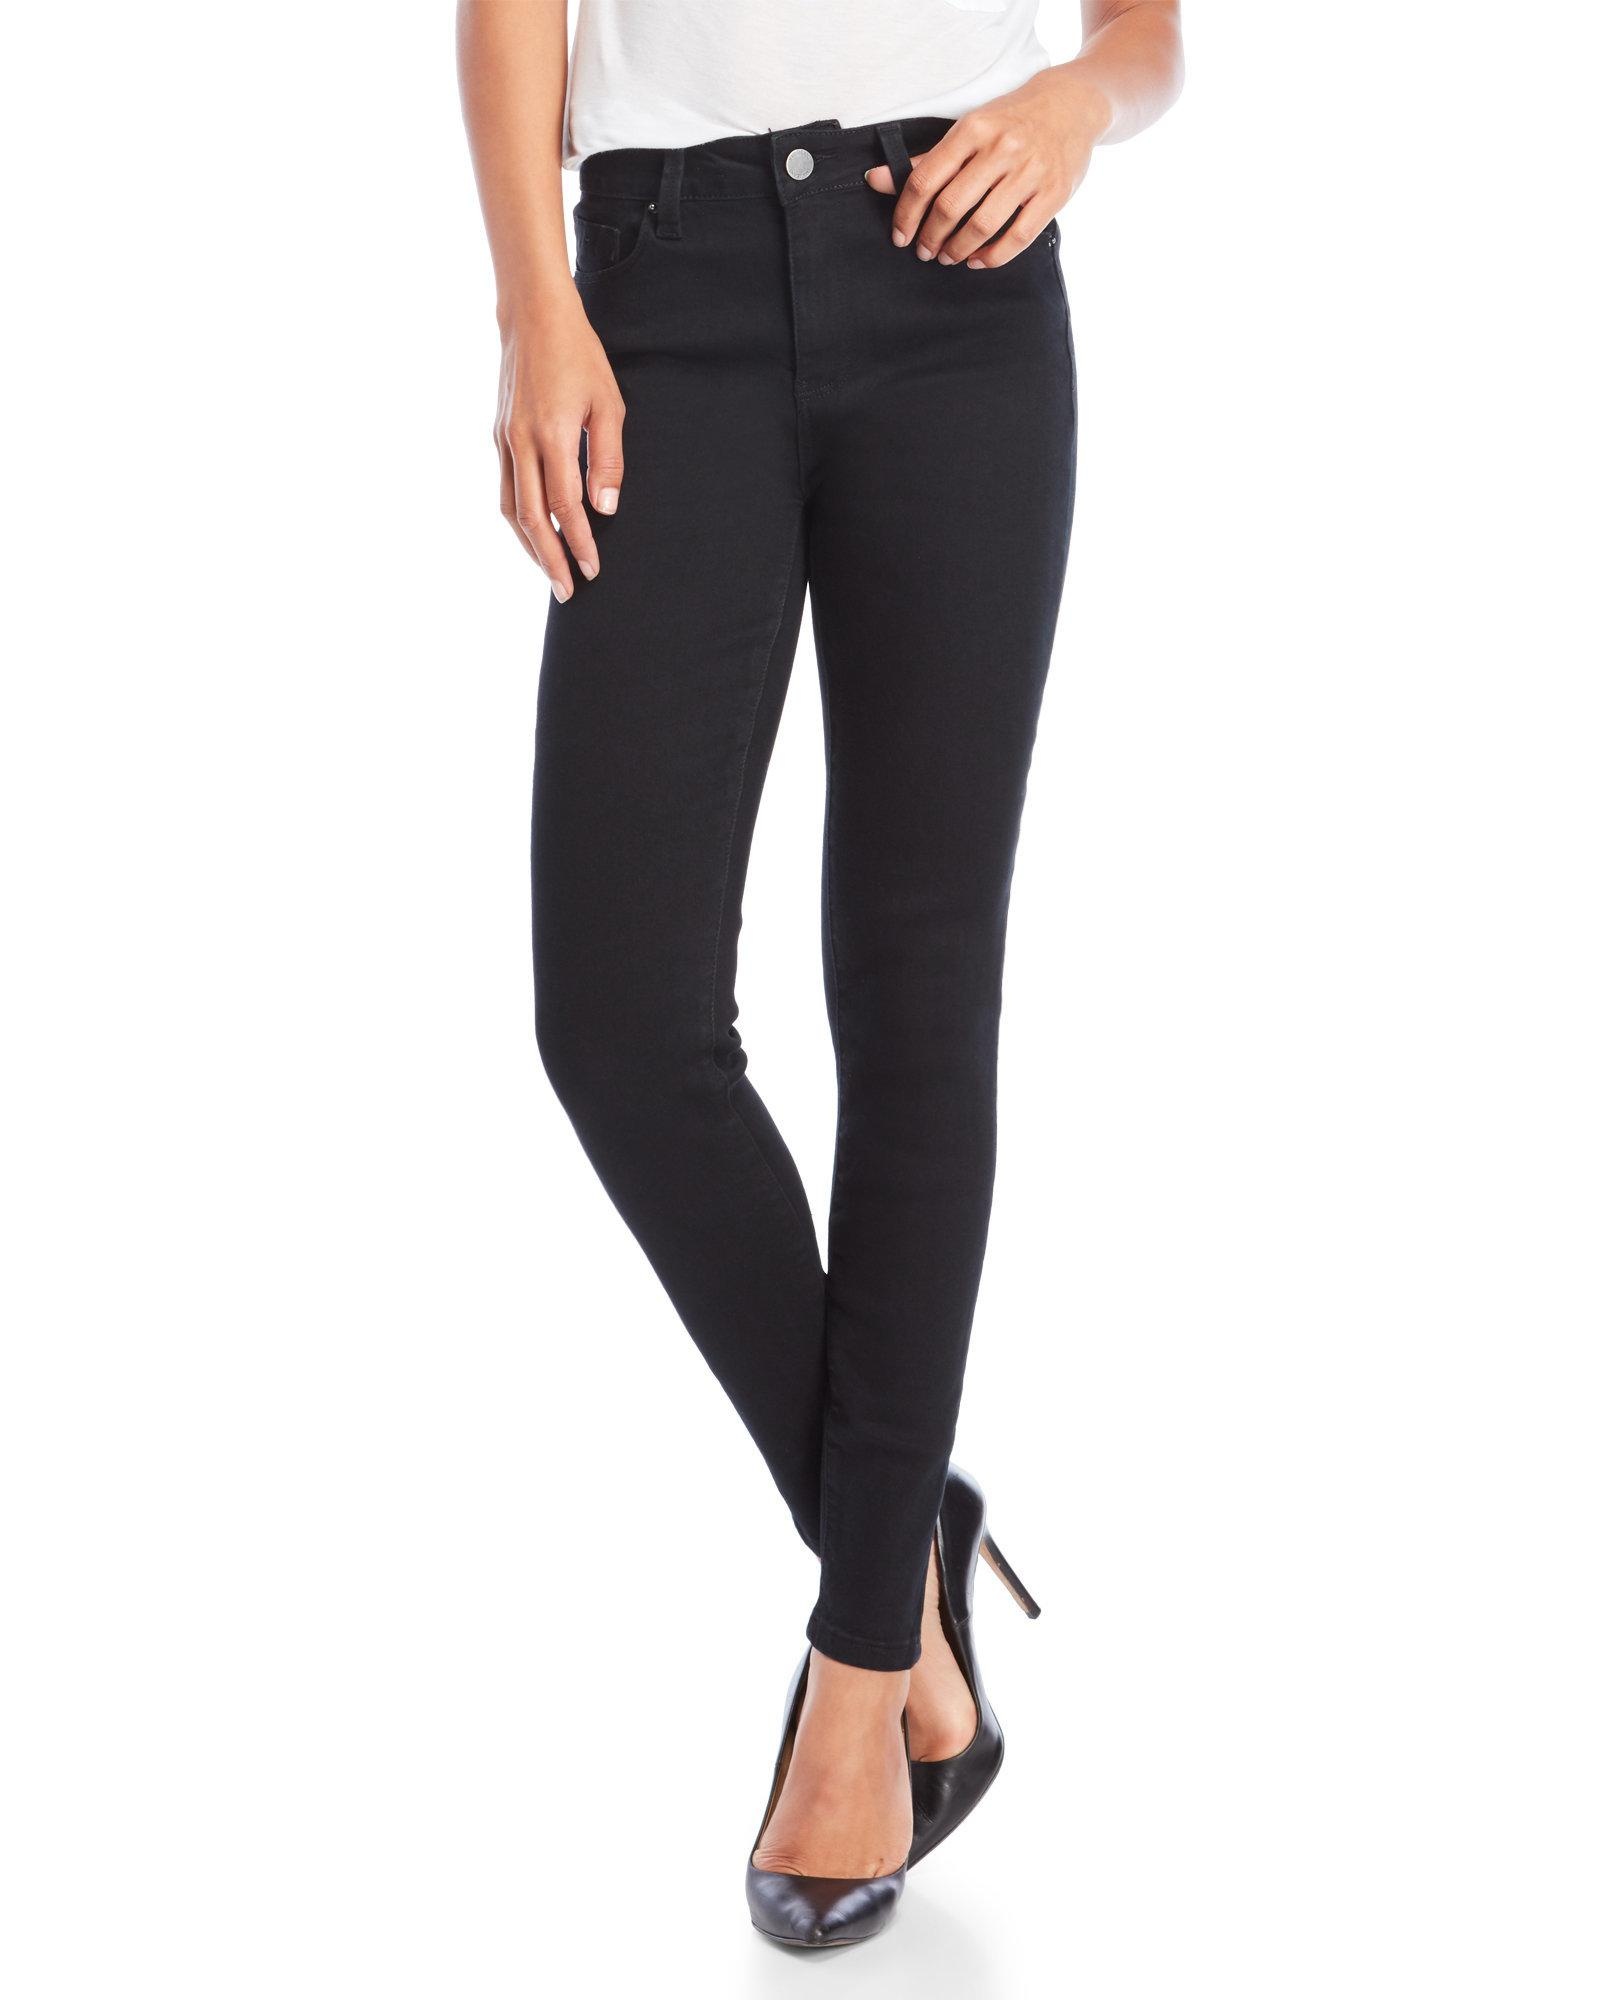 941b1b2dae YMI No Muffin Top High-Rise Skinny Jeans in Black - Lyst